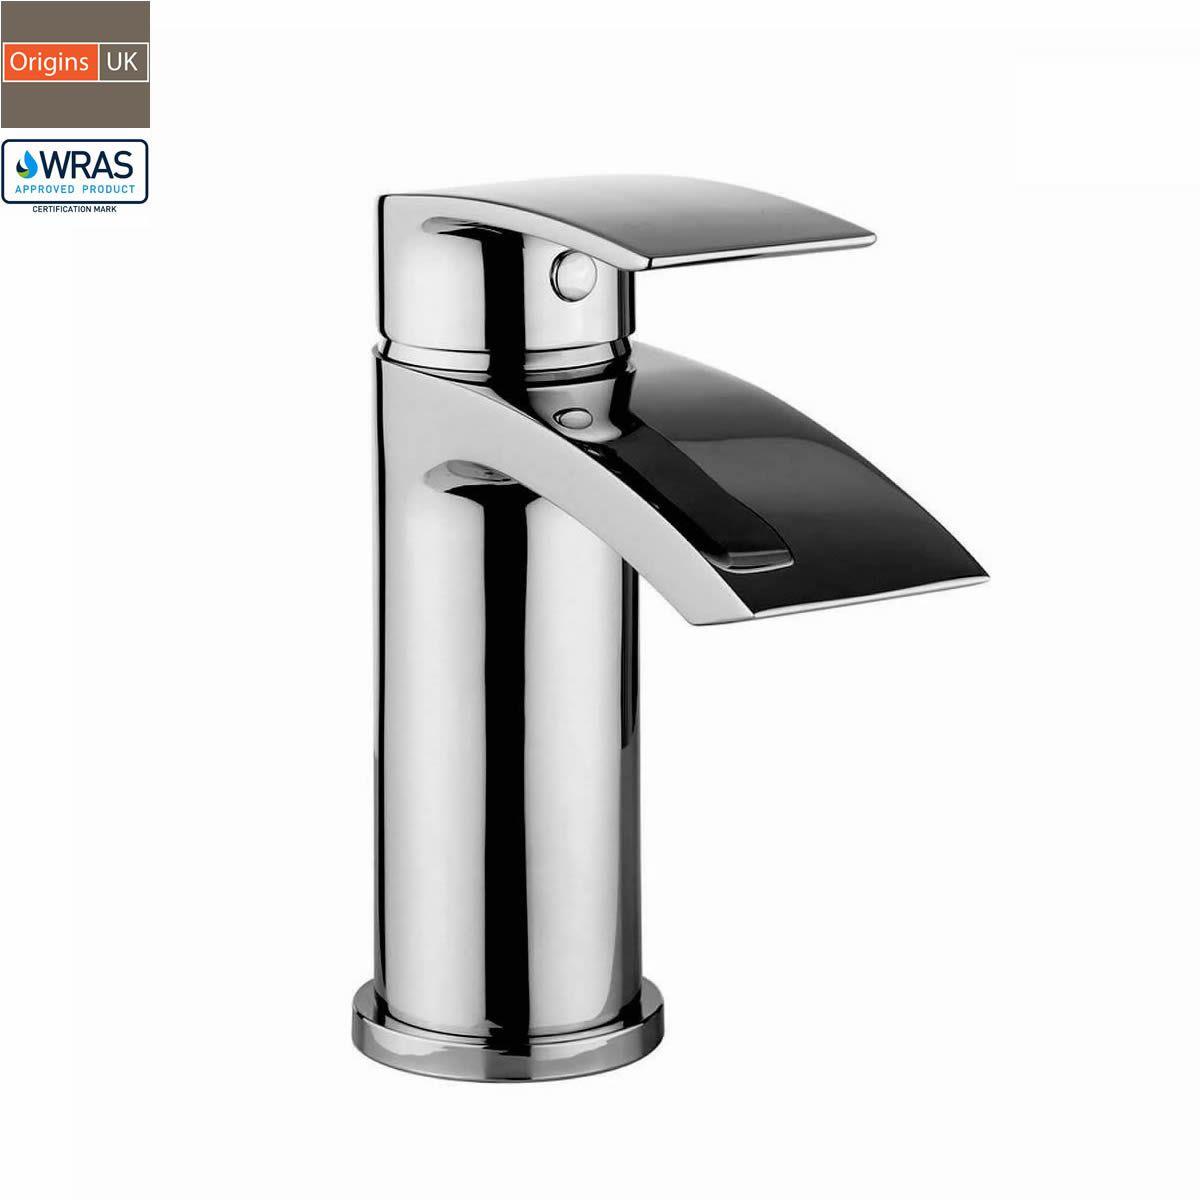 Bathroom basin mixer